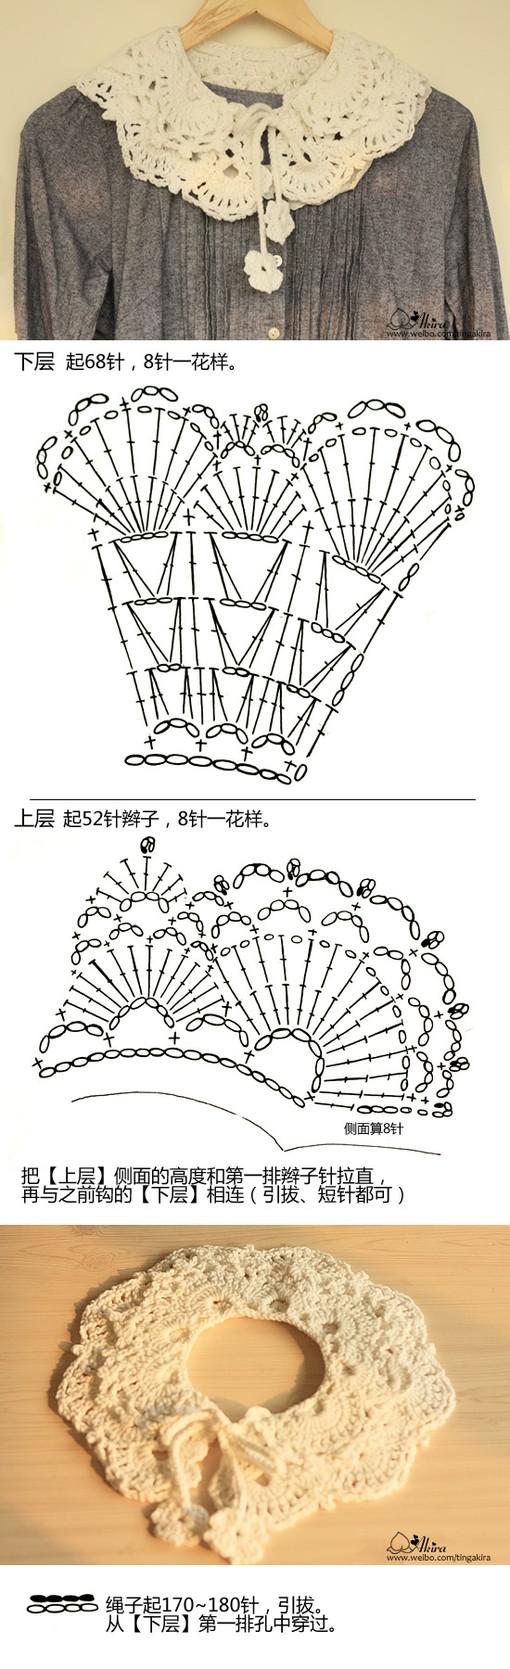 GALA ganchillo, hecho a mano, crochet, bricolaje, cerca de alambre, tejidos